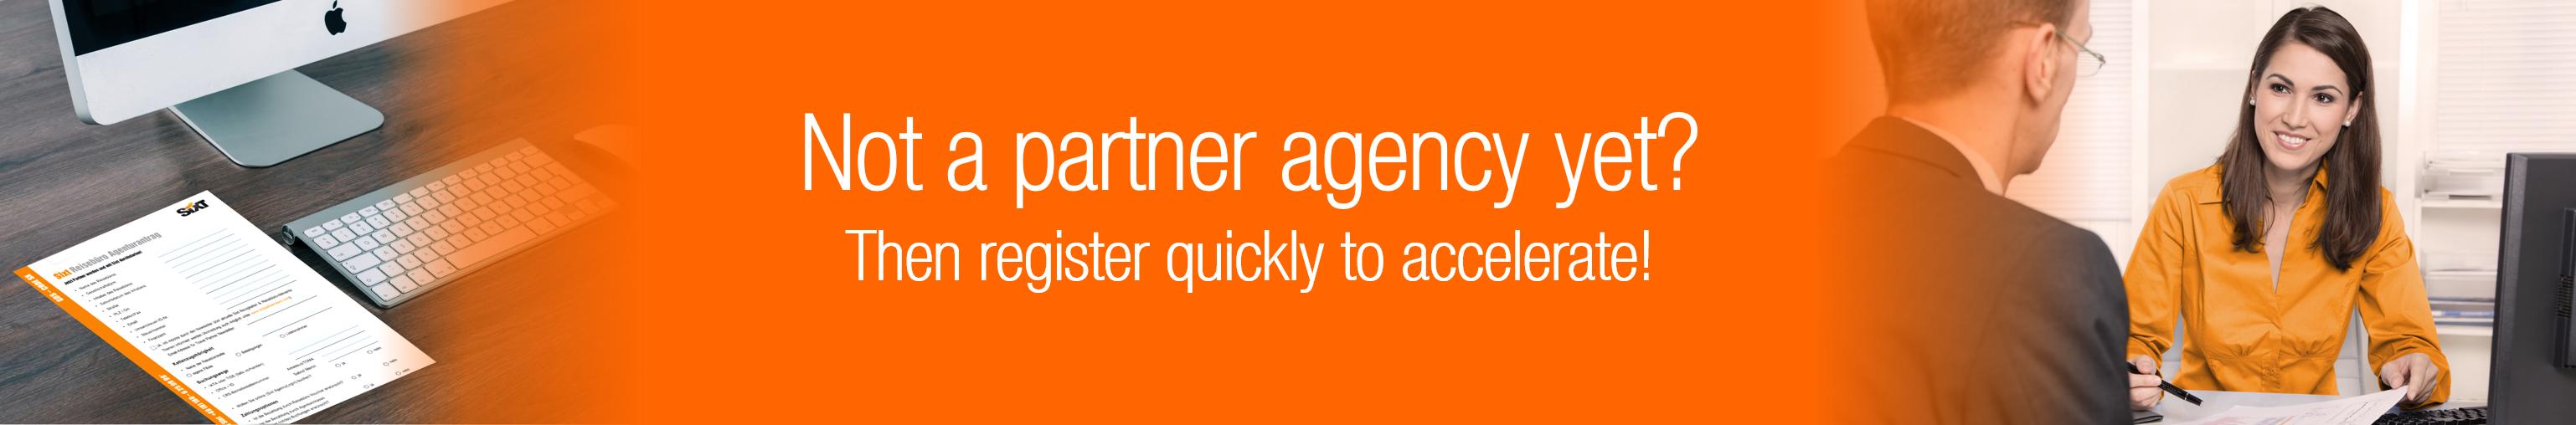 Not an agency partner yet